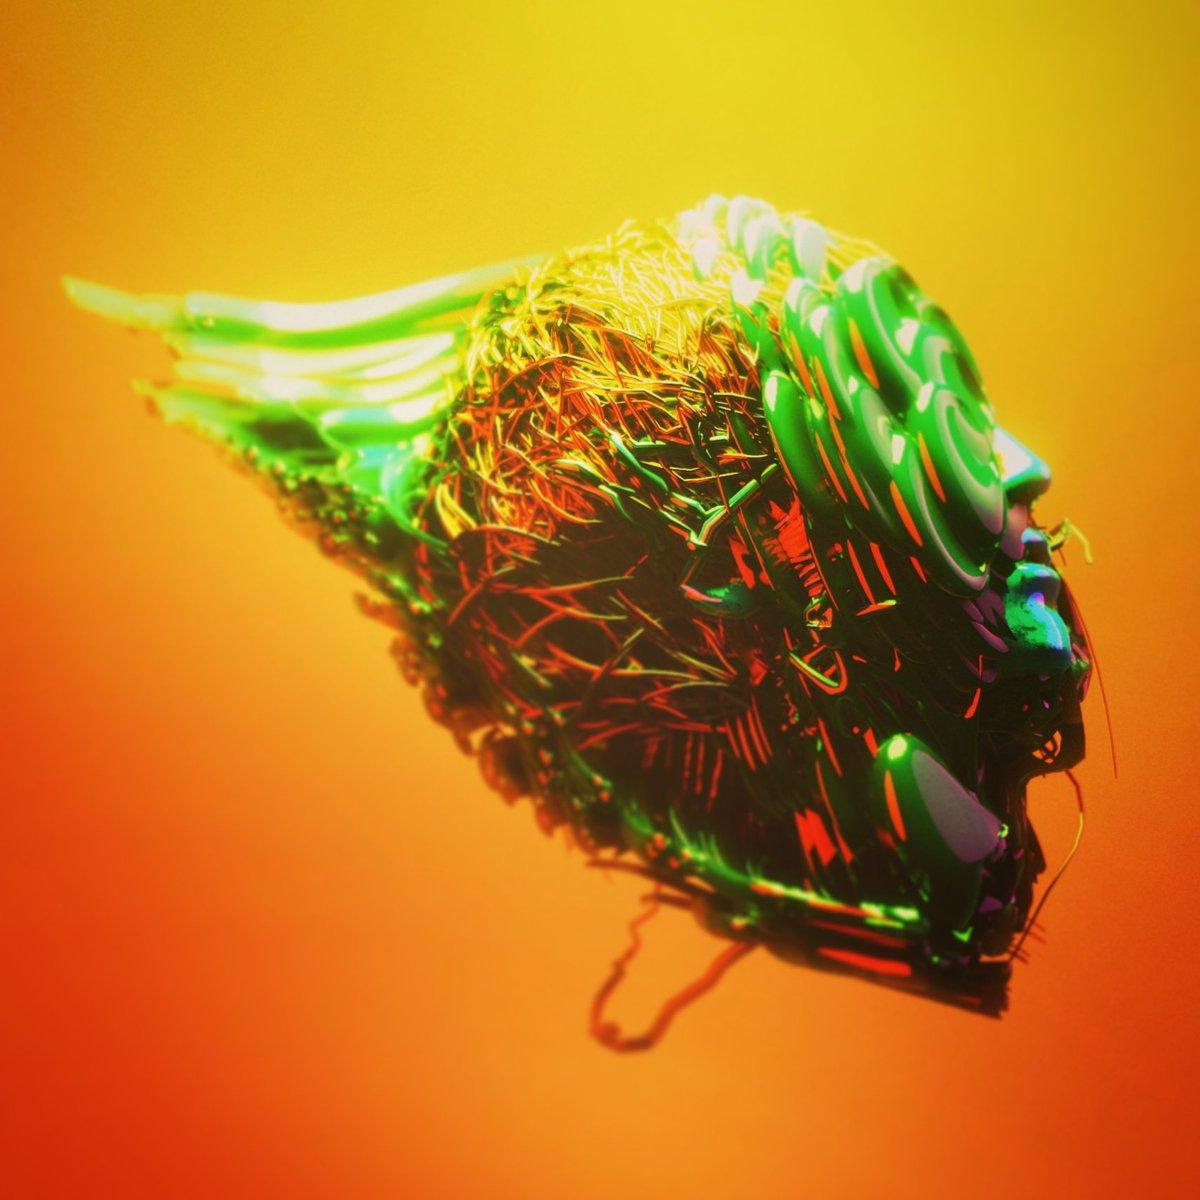 Head Mess - 3D Artwork  #3drender #b3d #eeveerender #3dartpic.twitter.com/FUtY5XlzIu